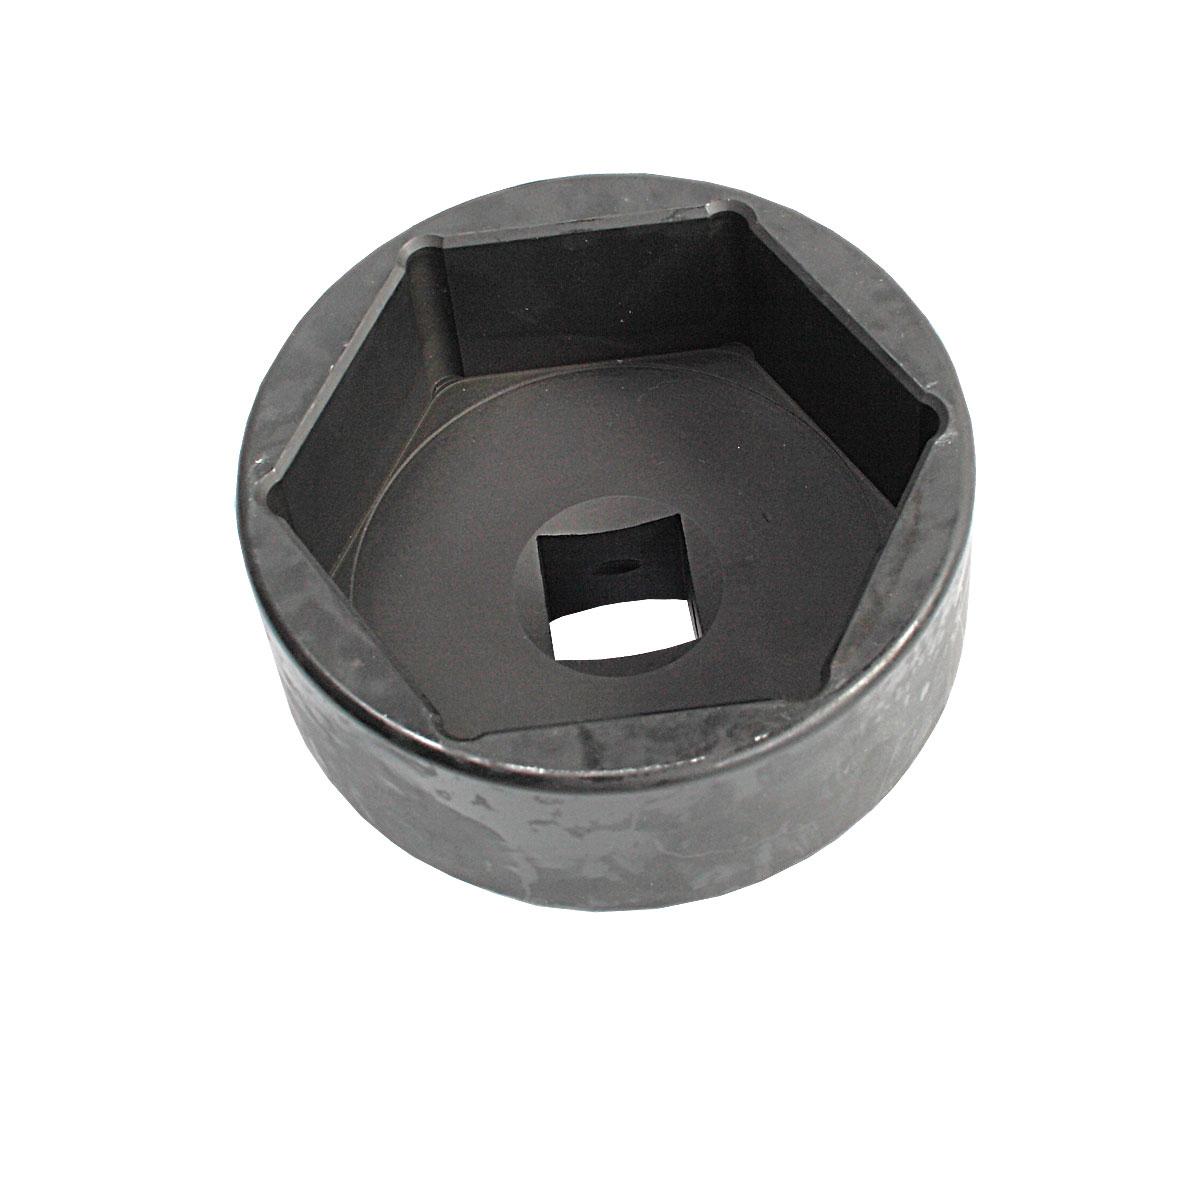 Сервисная головка 6 граней 95 мм Car-Tool CT-B1320-095